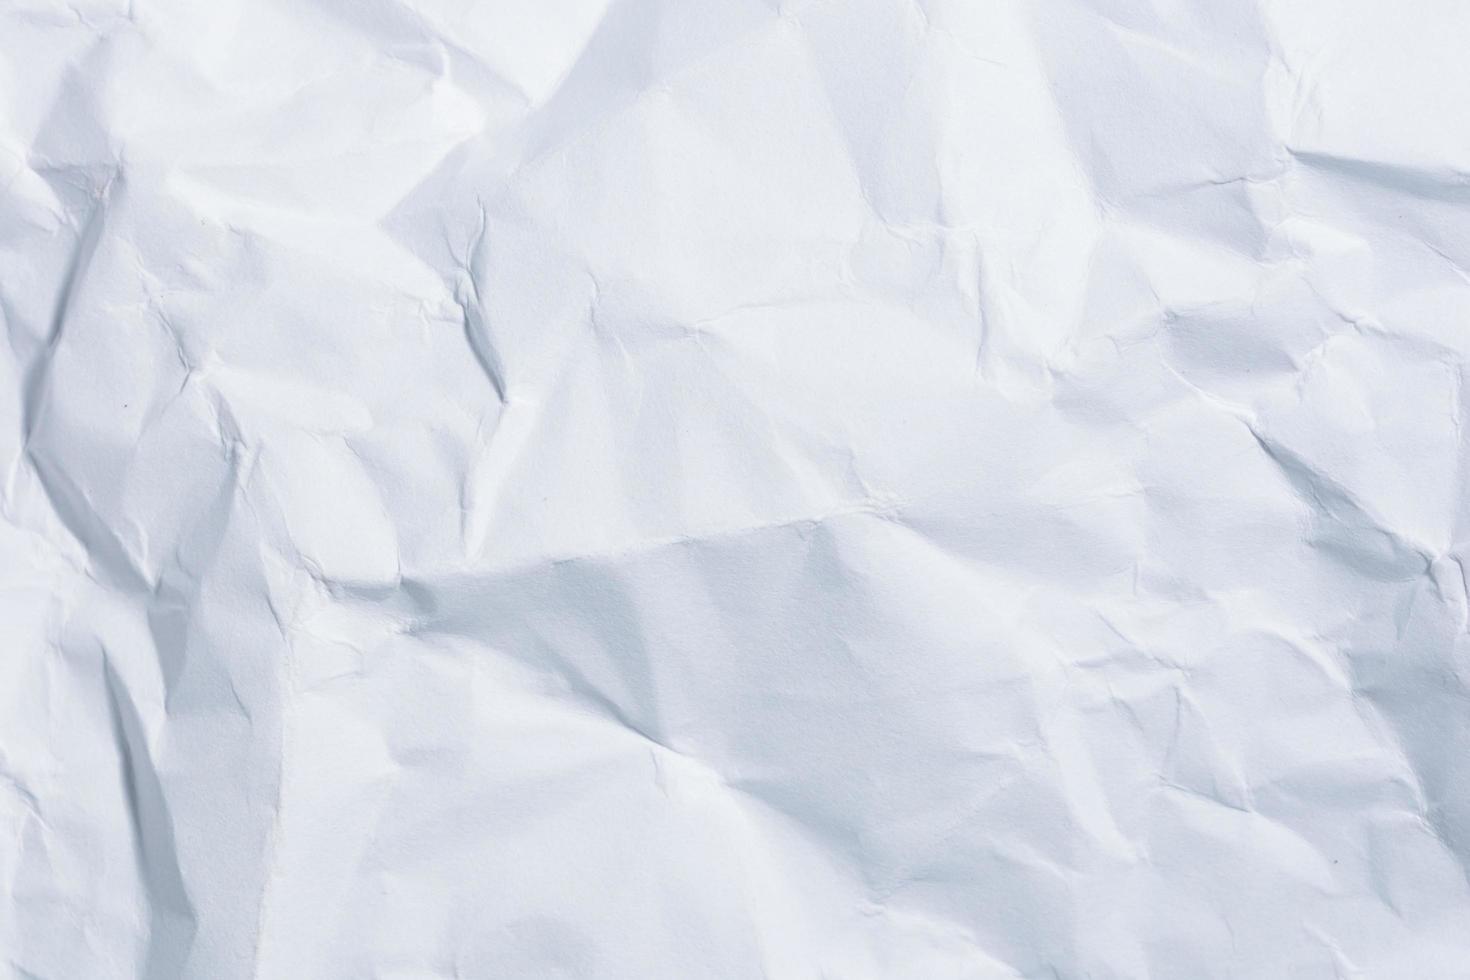 witte gekreukeld papier achtergrond foto